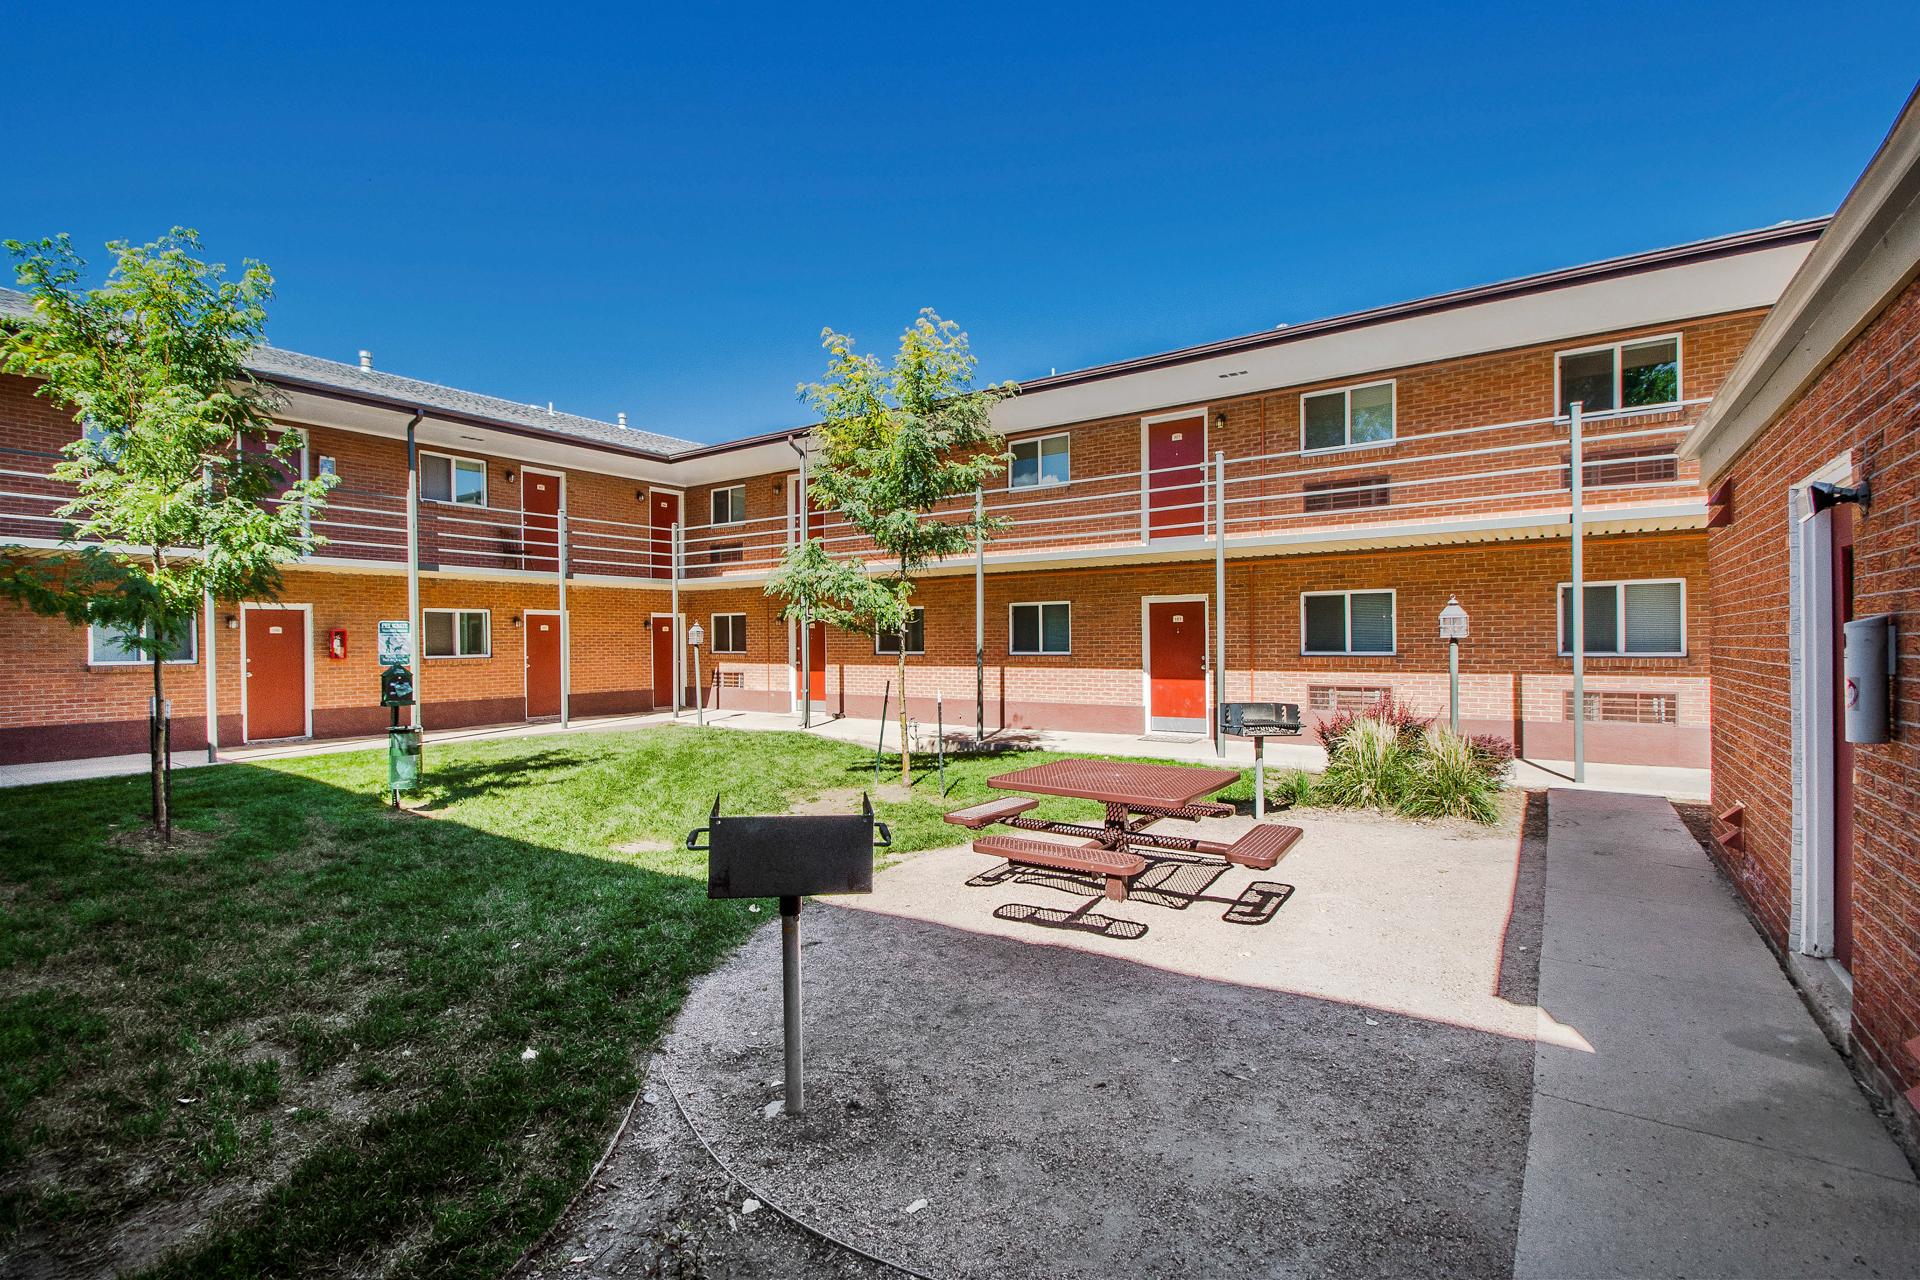 Fillmore Ridge - Colorado Springs, CO Apartments for rent